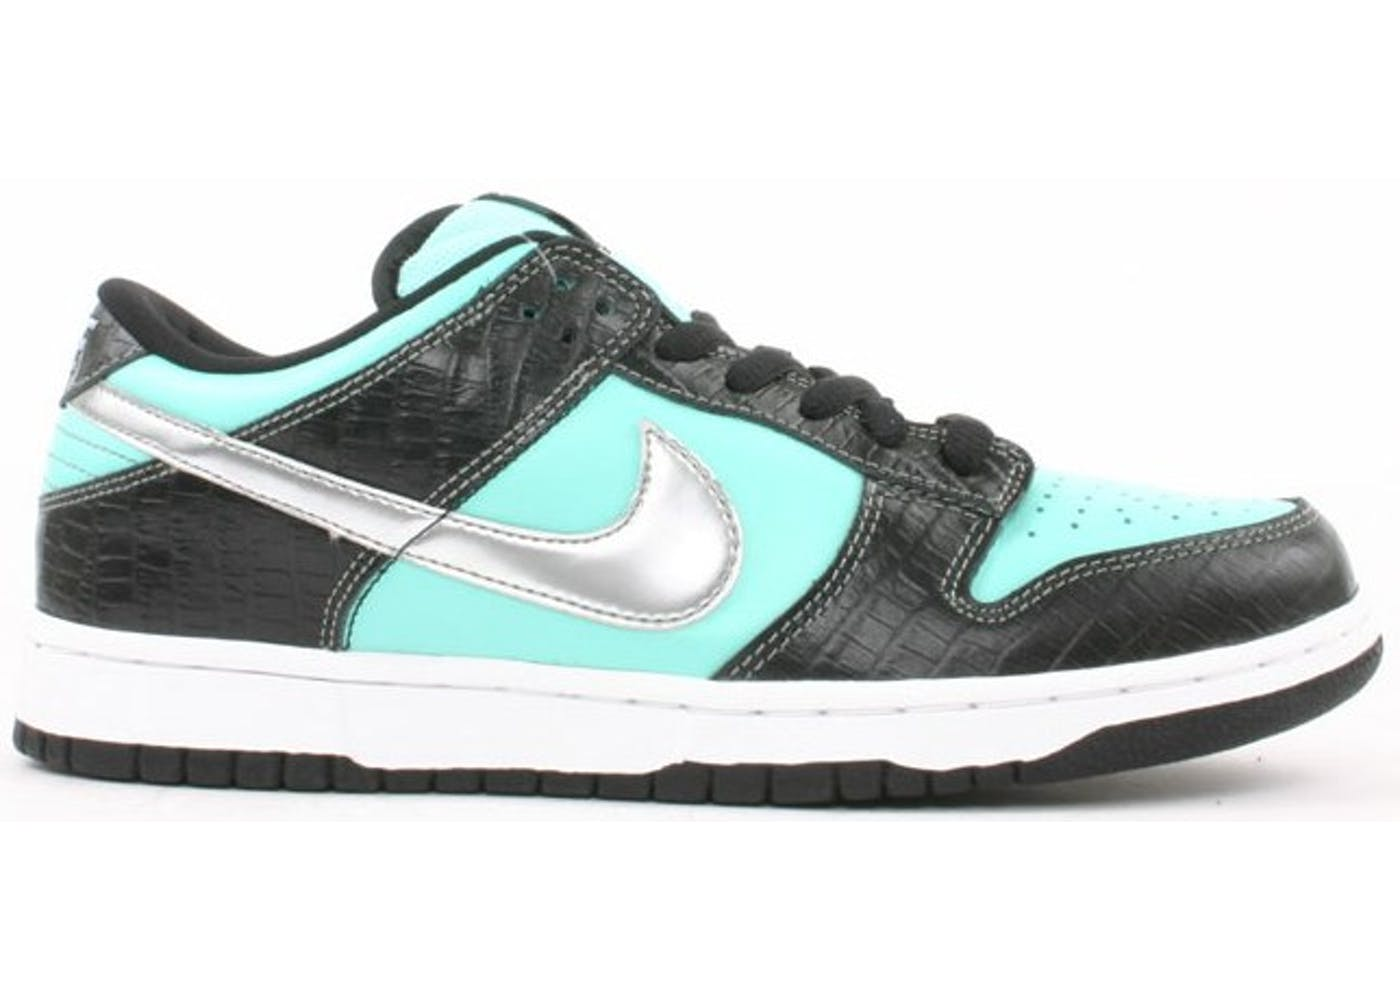 2fcbc0d9c680df ... Tiffany Nike Dunk SB Low Diamond Supply Co. ...